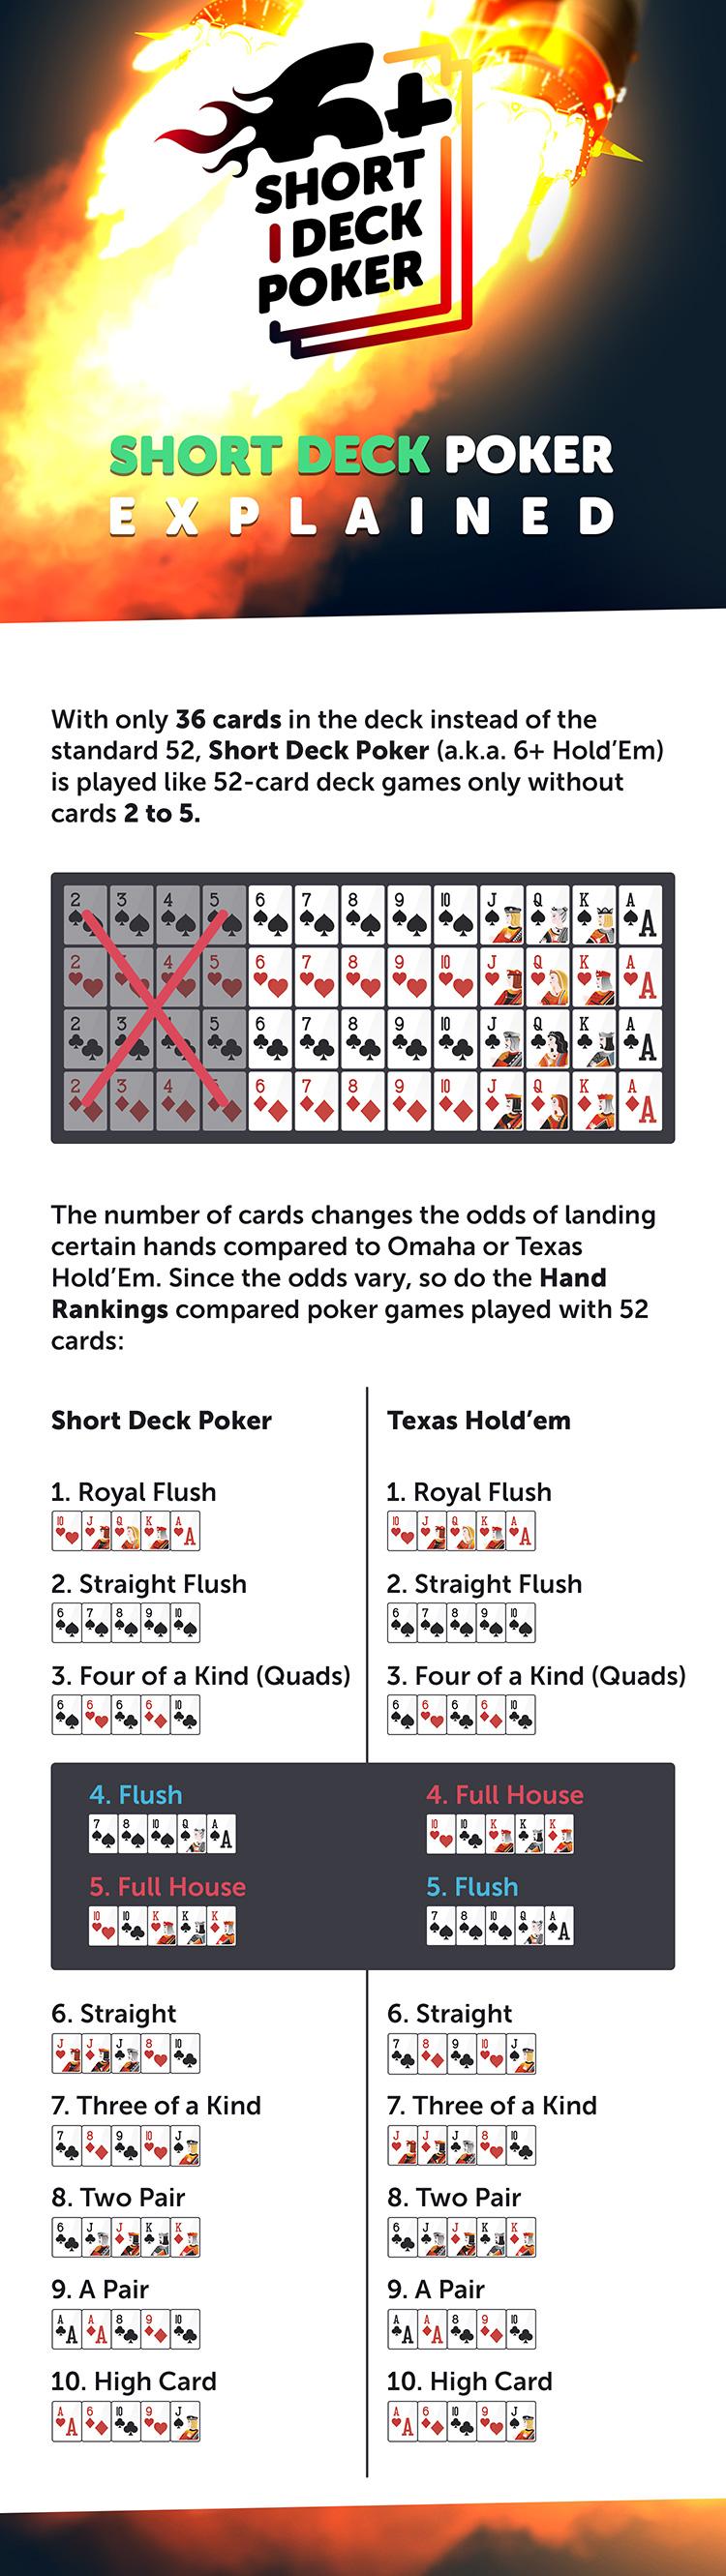 Short Deck Poker Rules on CoinPoker